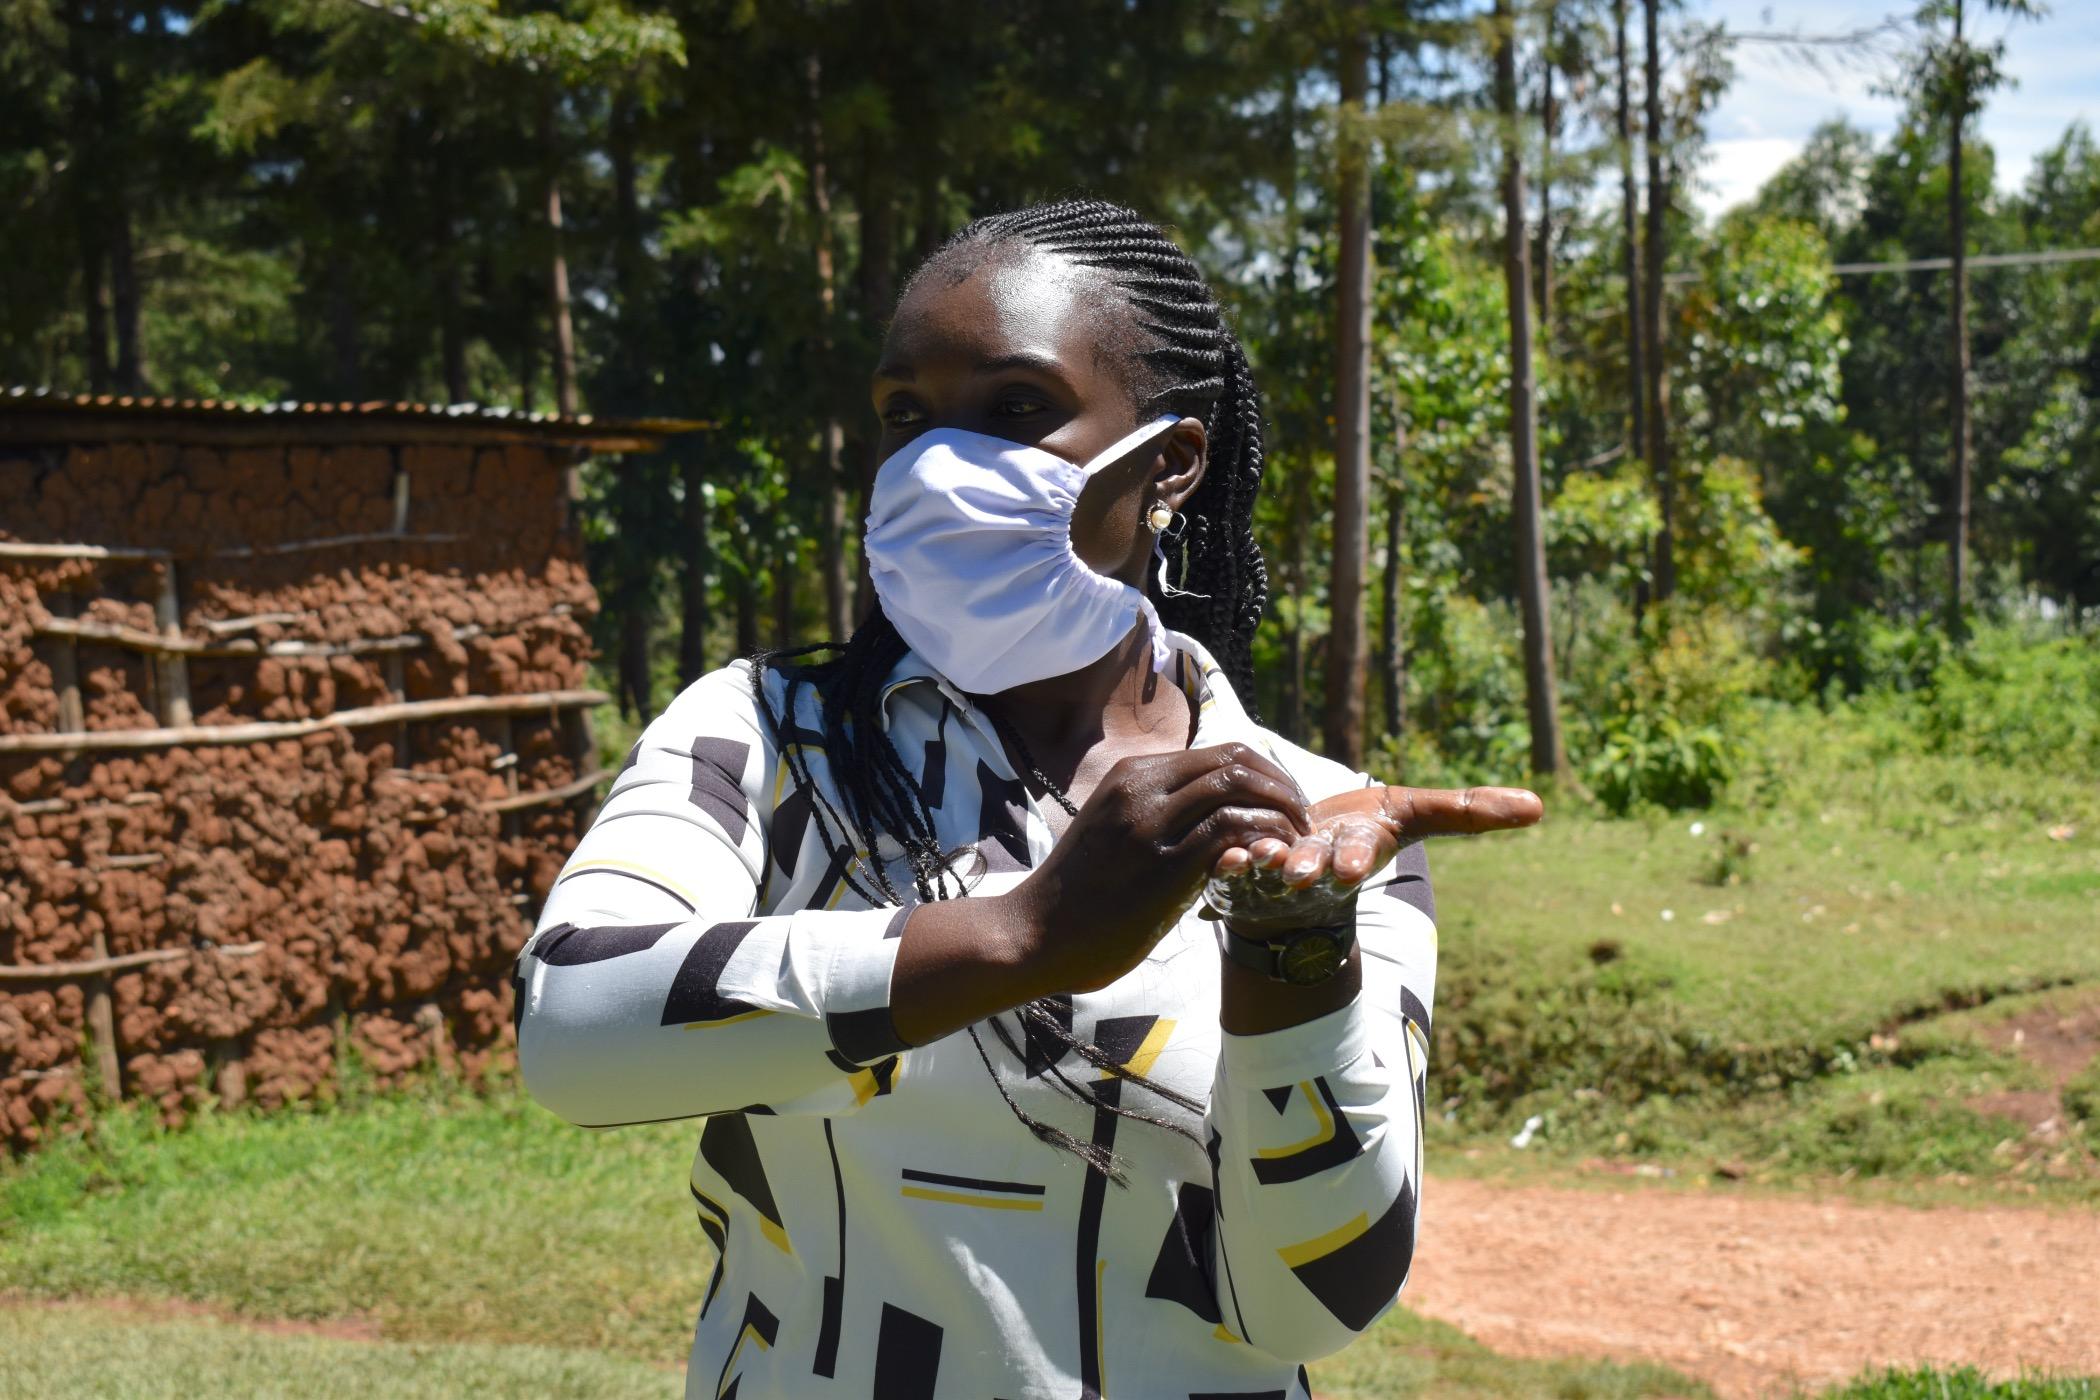 The Water Project : 6-covid19-kenya18136-miss-alulu-demonstrating-handwashing